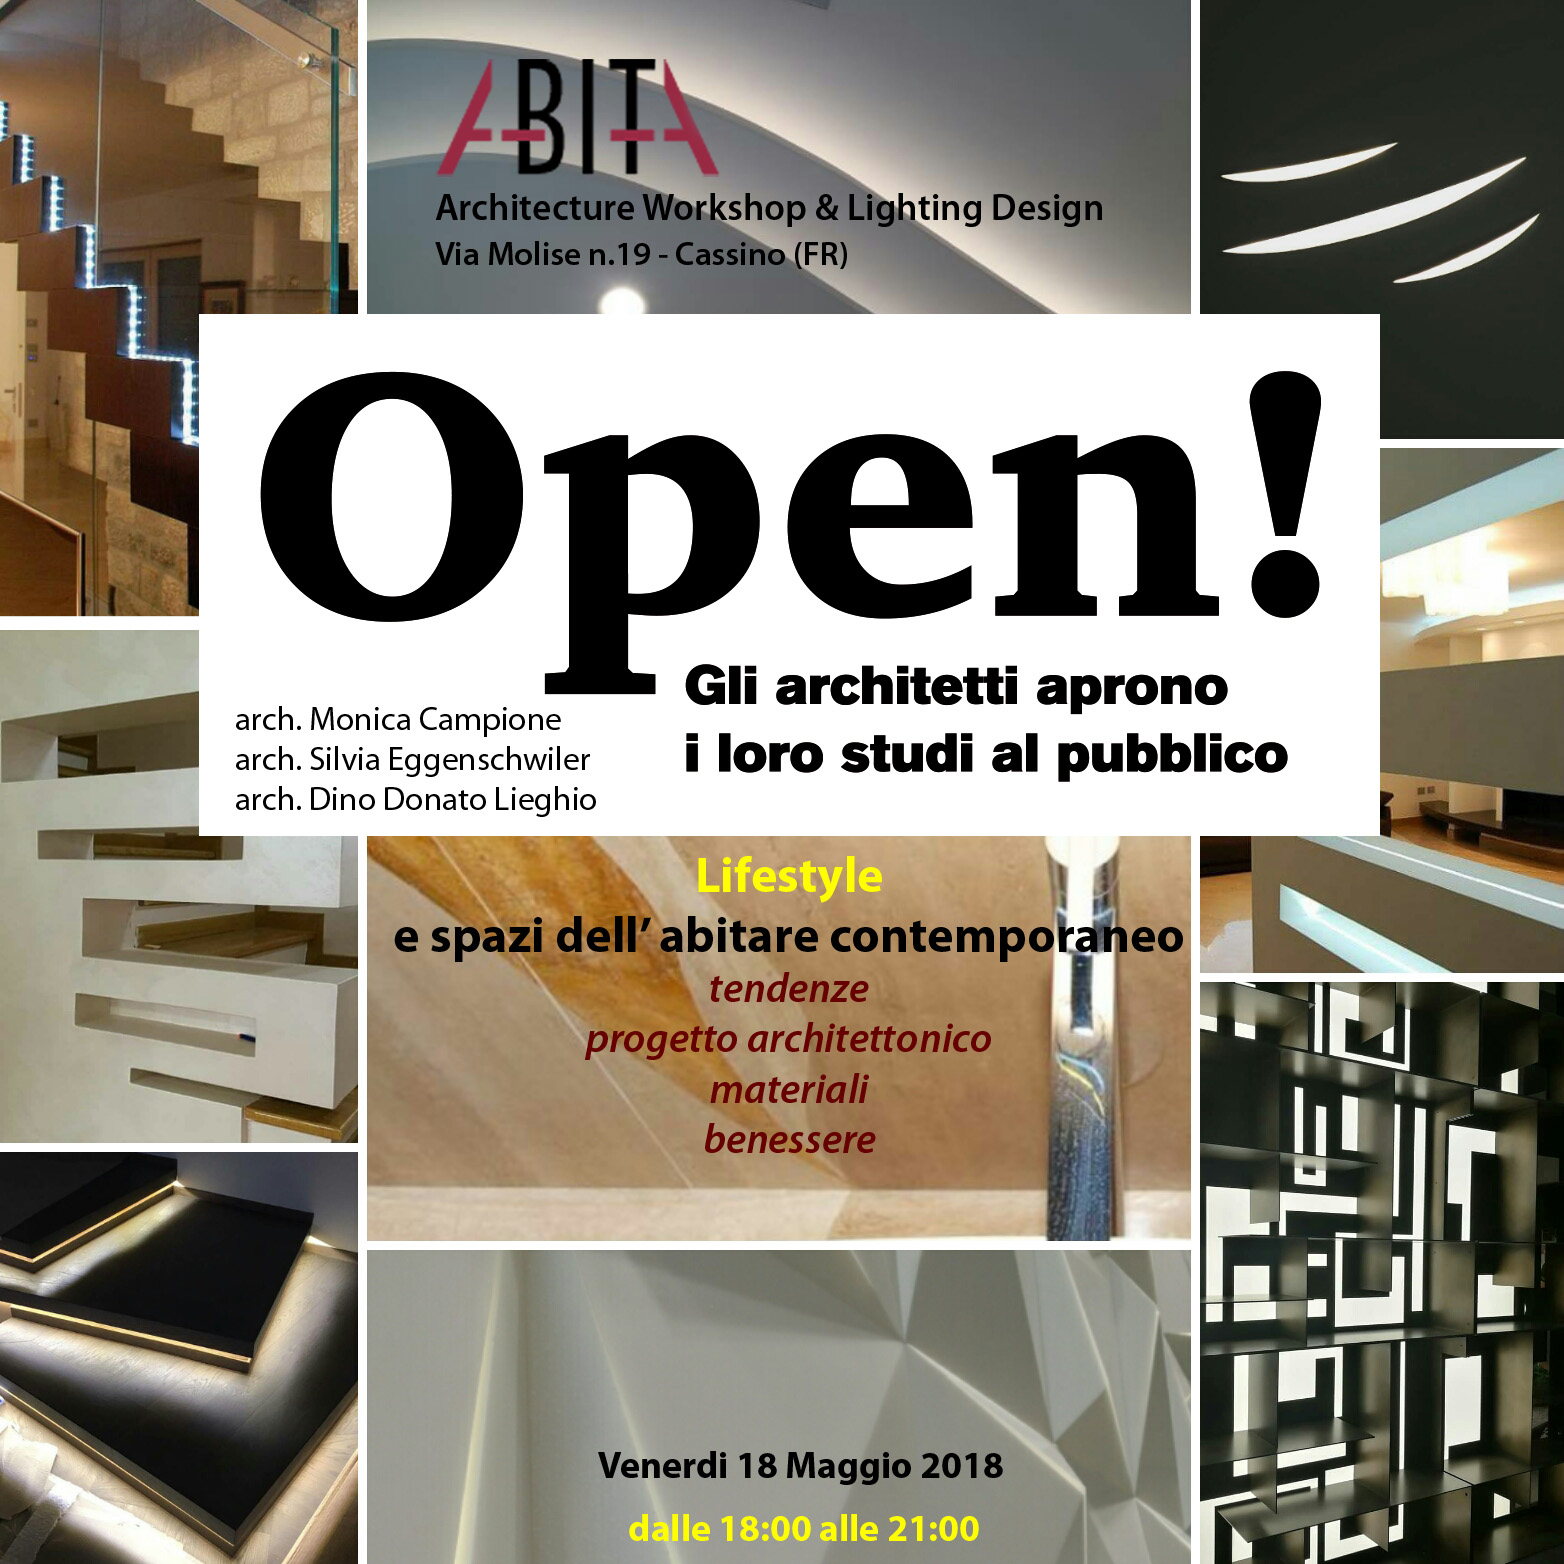 A-bit-A architecture workshop & lighting design